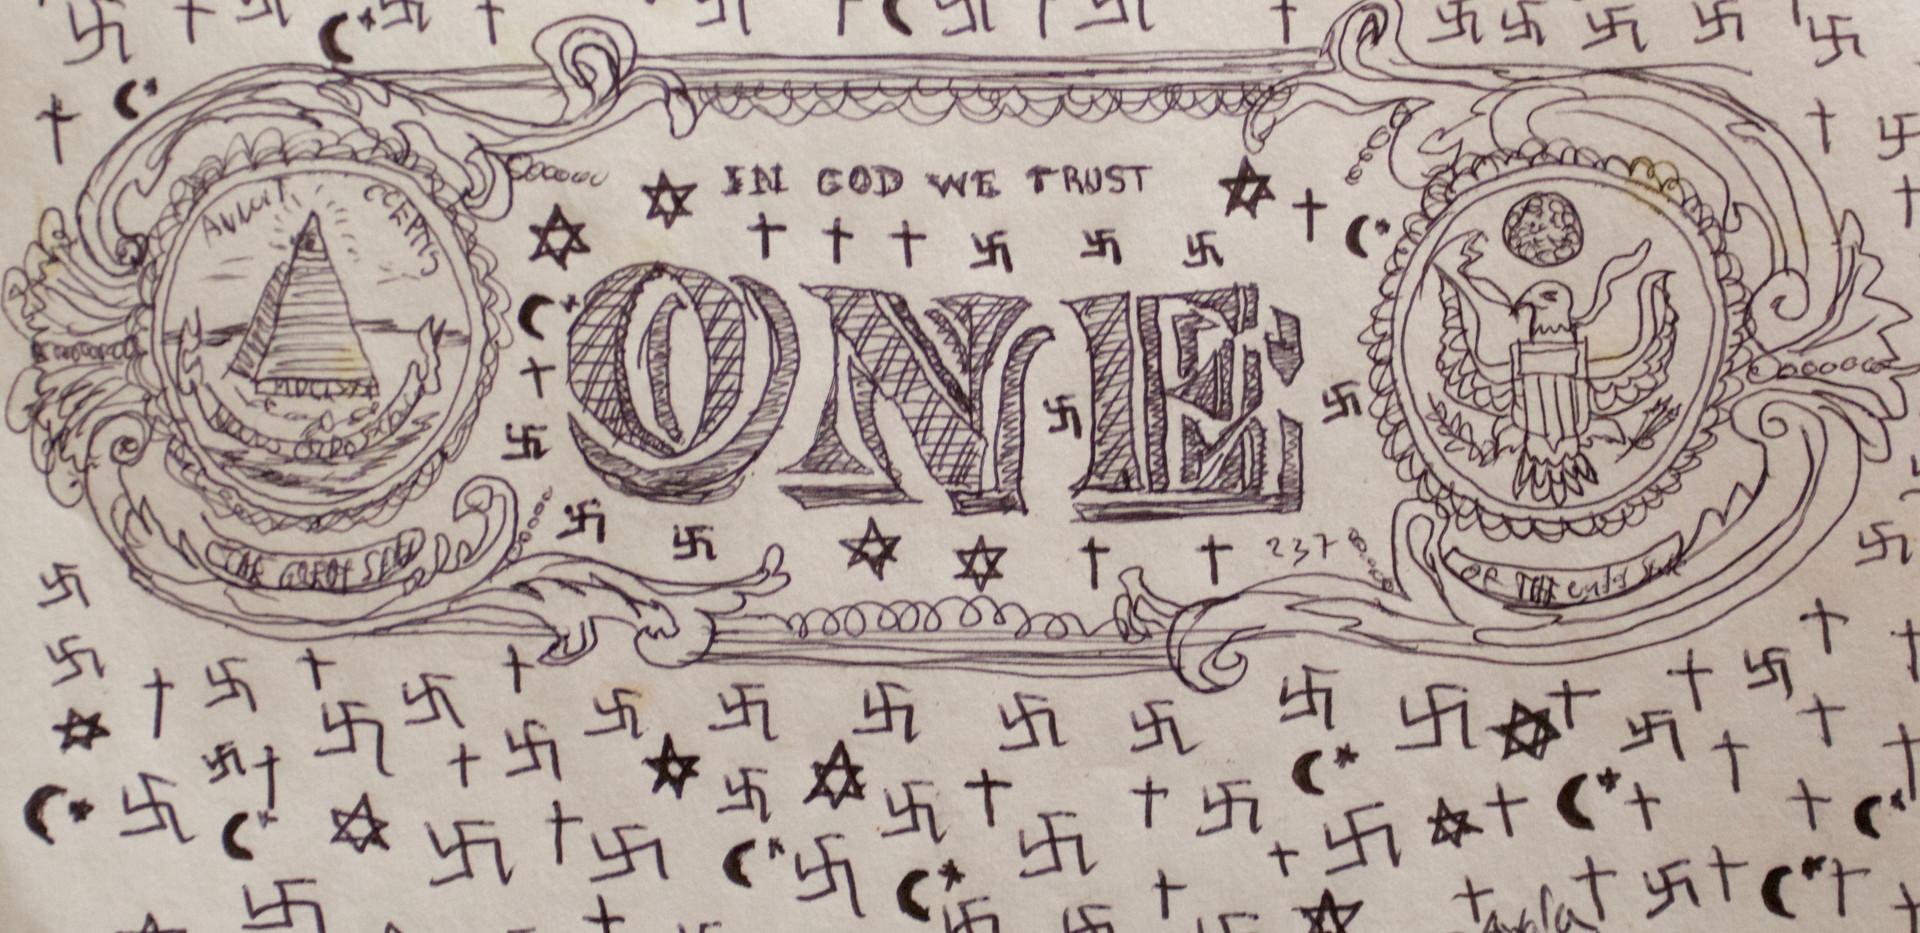 In God We Trust Study.